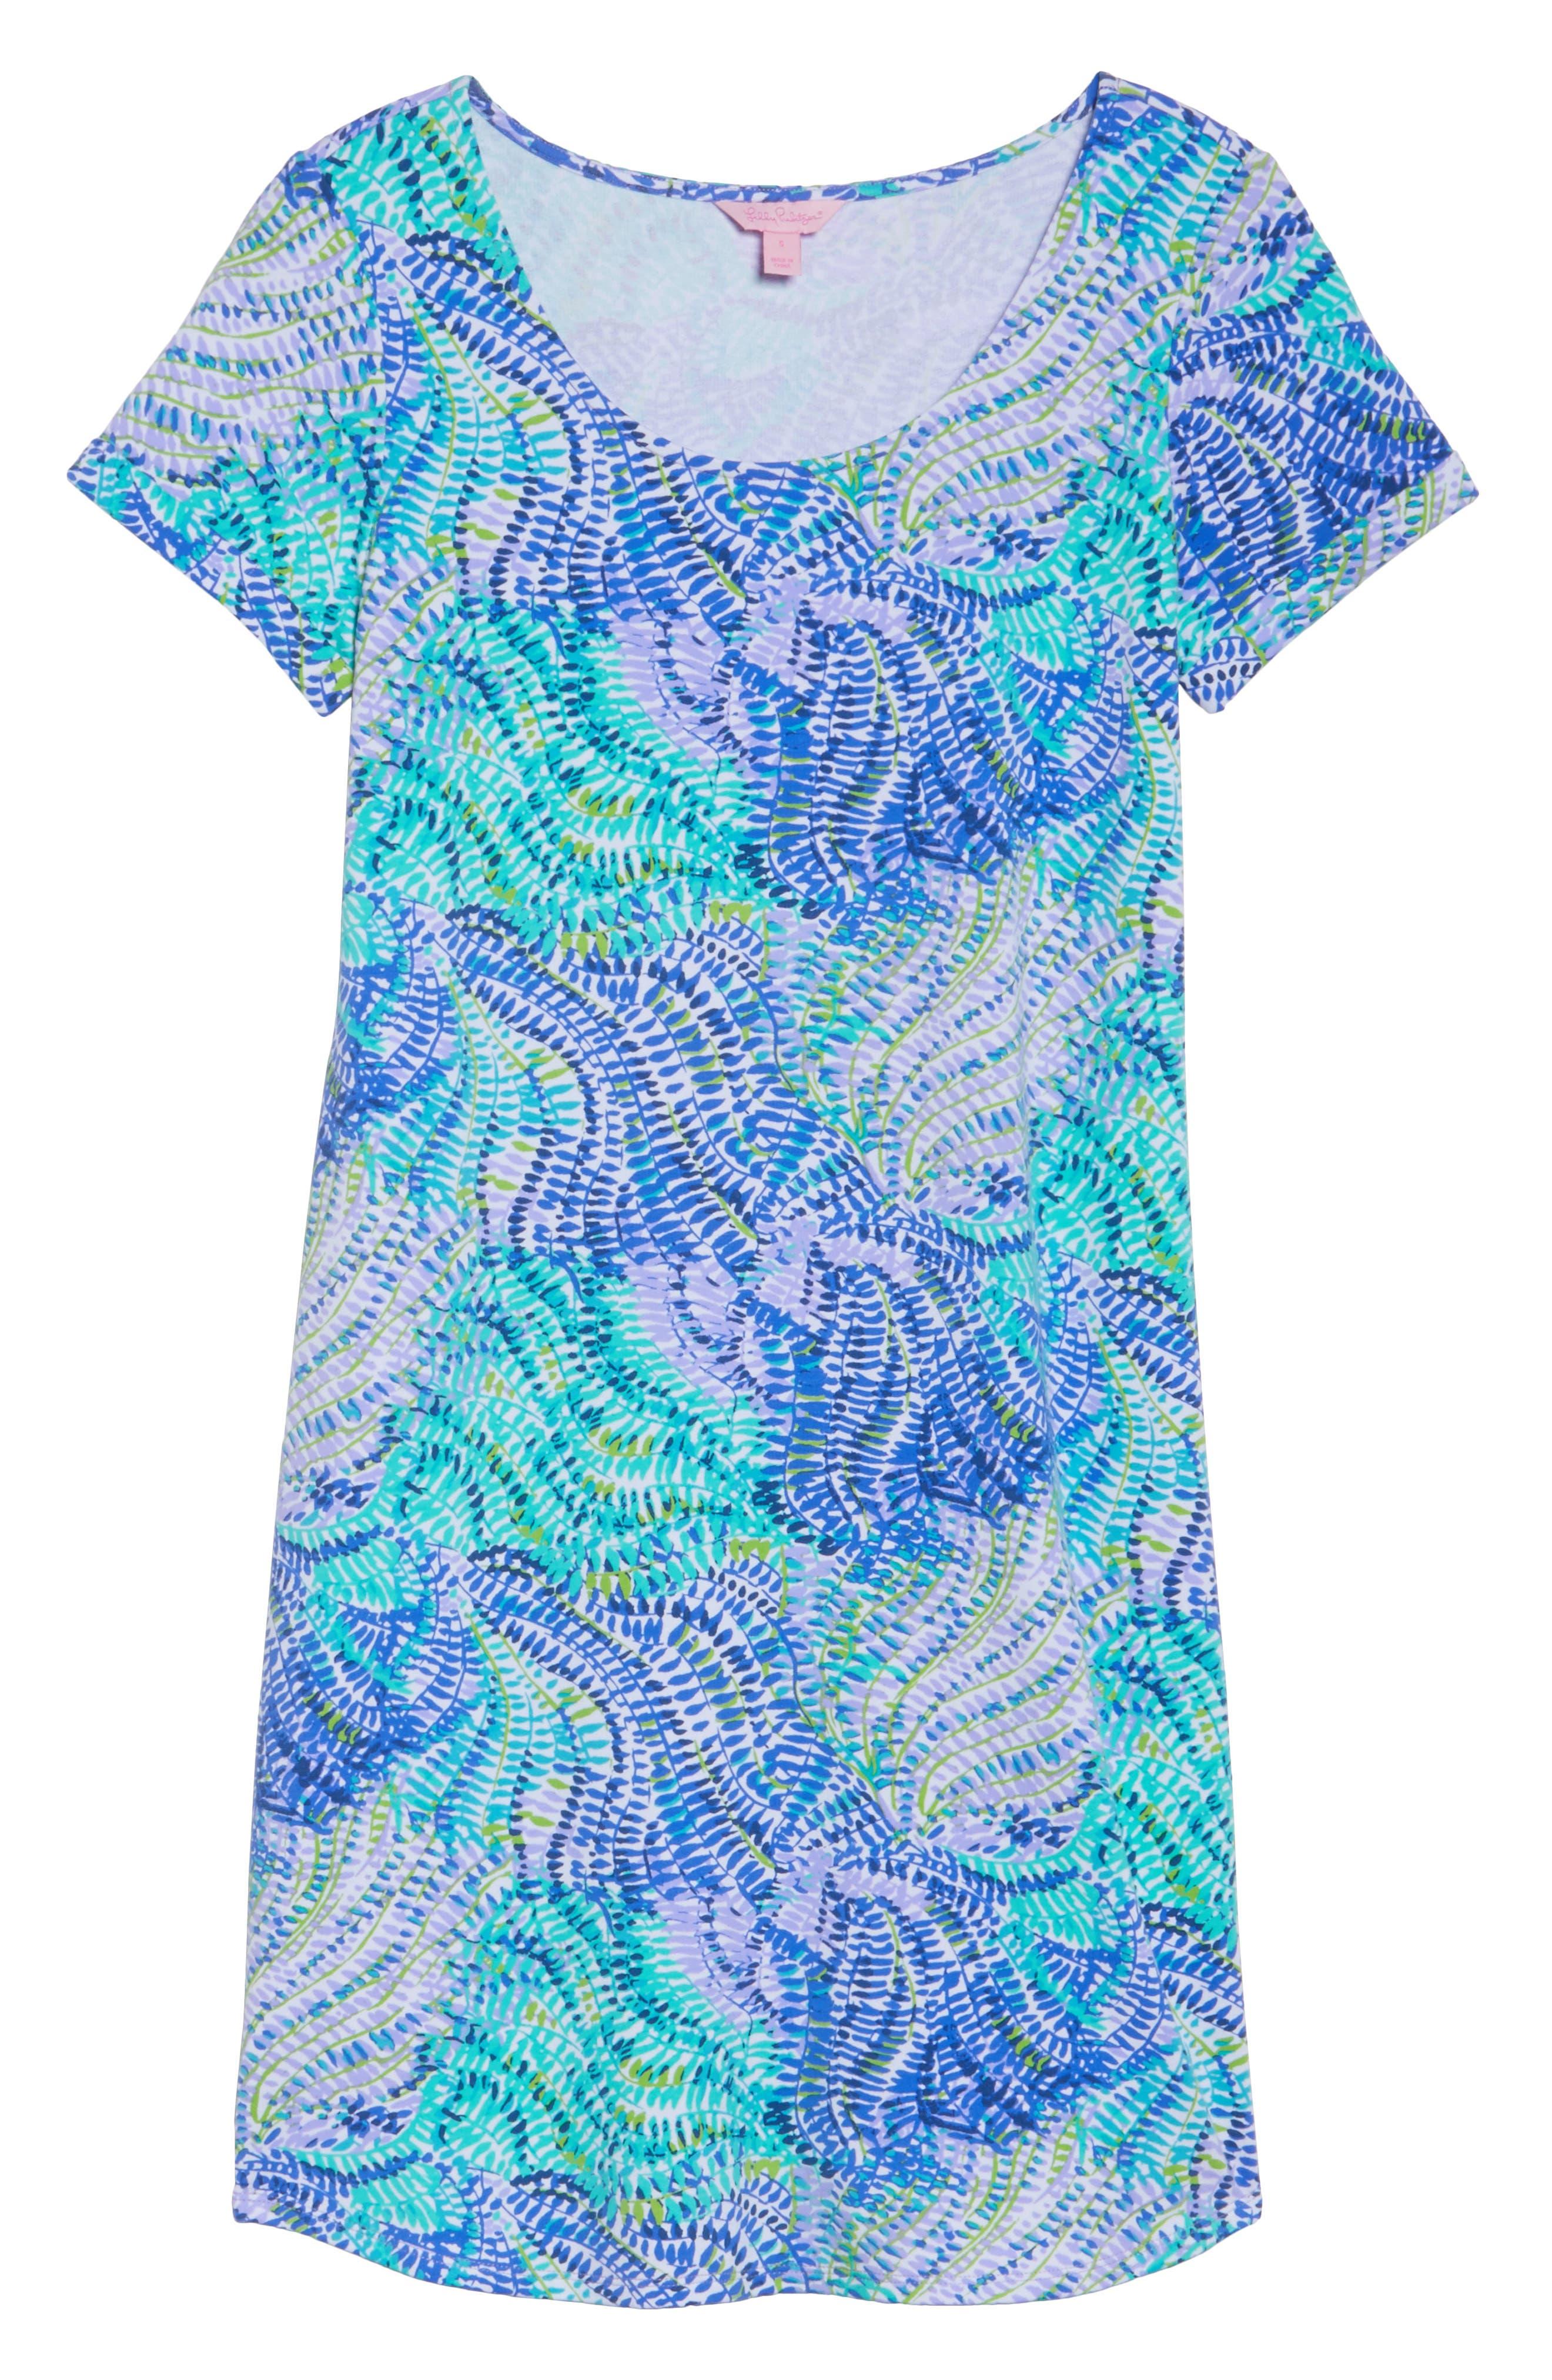 Tammy UPF 50 Dress,                             Alternate thumbnail 6, color,                             Blue Current